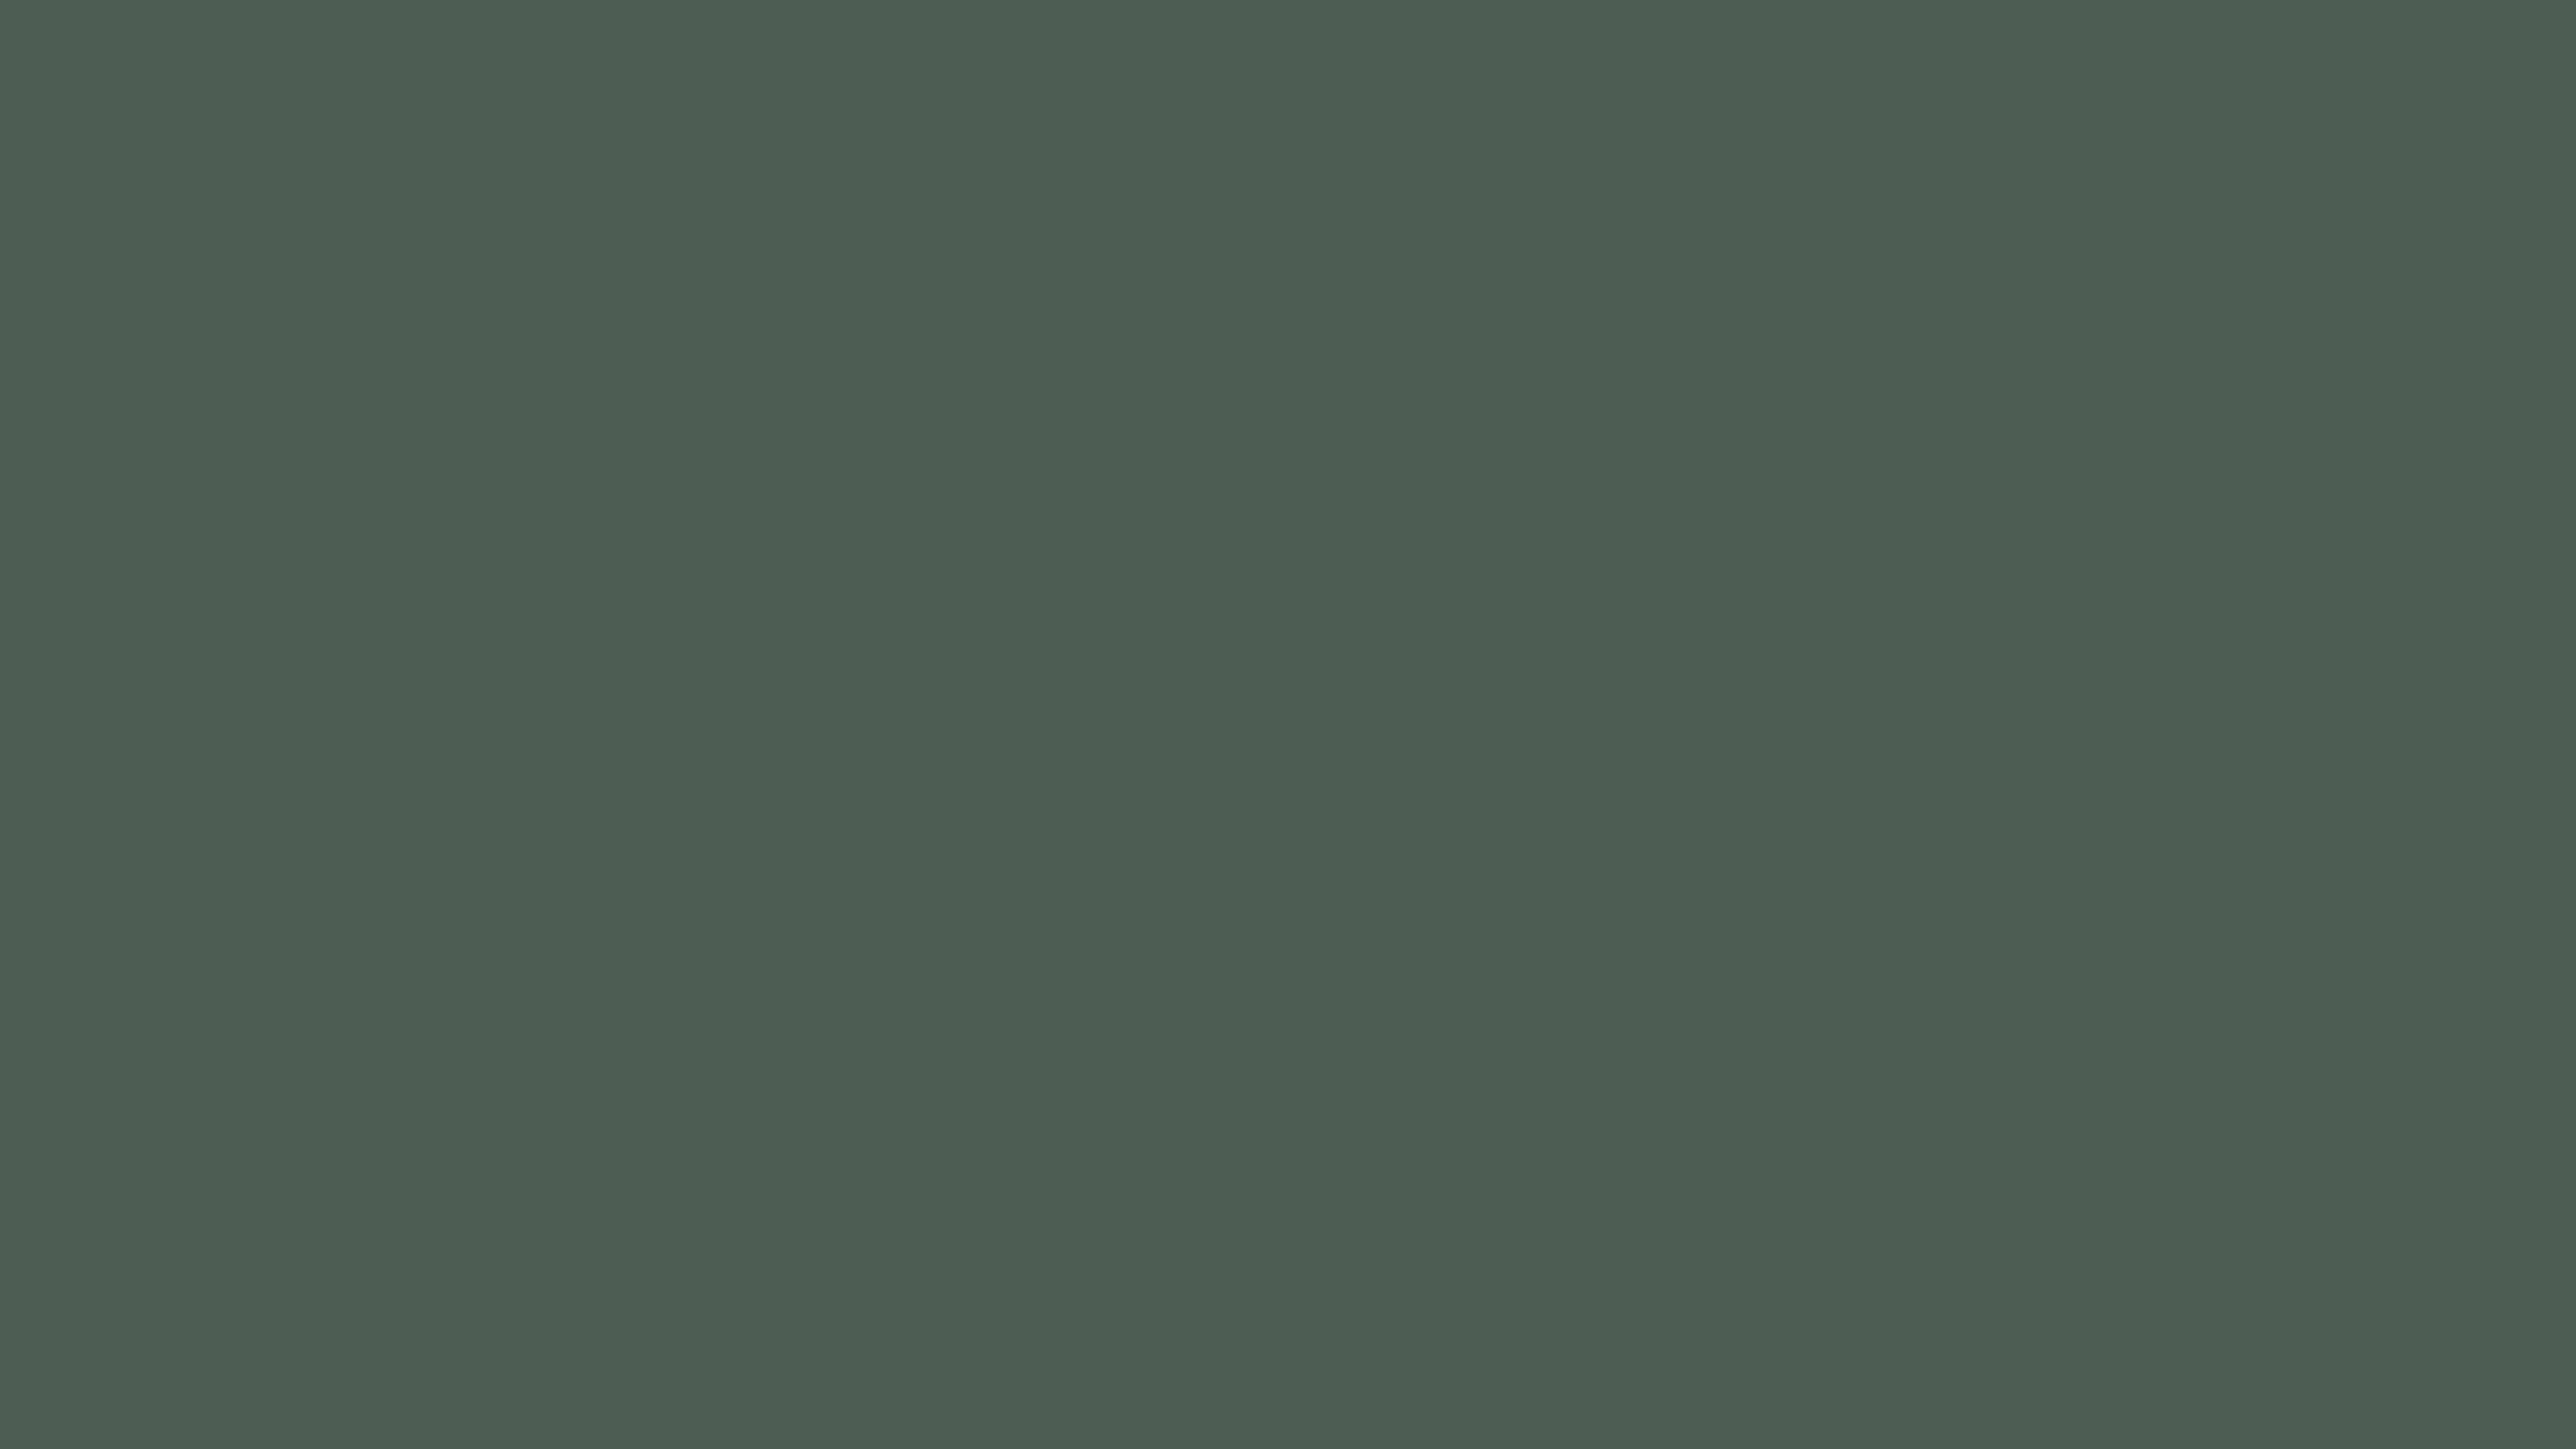 7680x4320 Feldgrau Solid Color Background